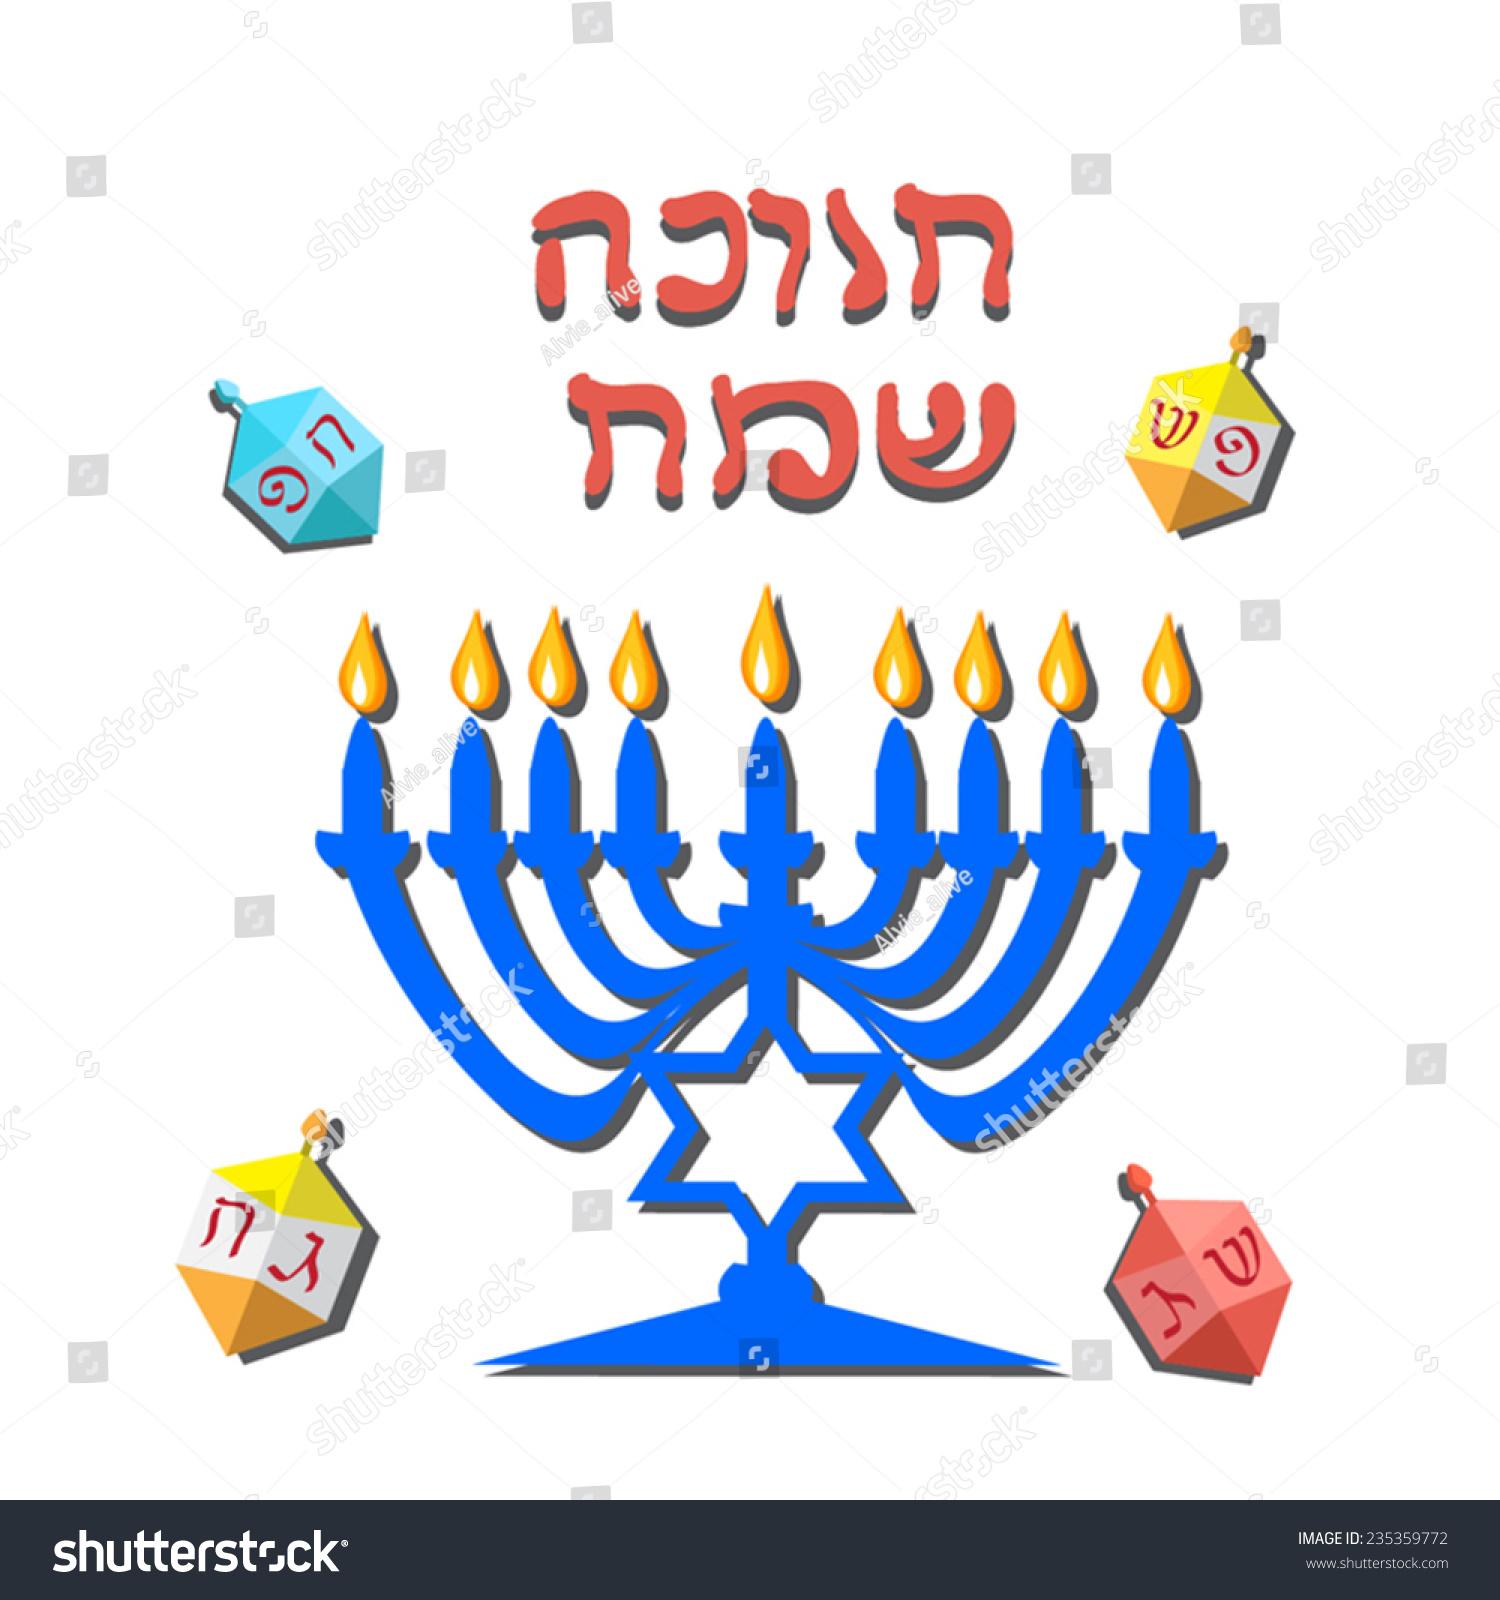 Happy hanukkah greeting vector illustration menorah stock vector happy hanukkah greeting vector illustration menorah candlestick multicolor draidels symbols of hanukkah m4hsunfo